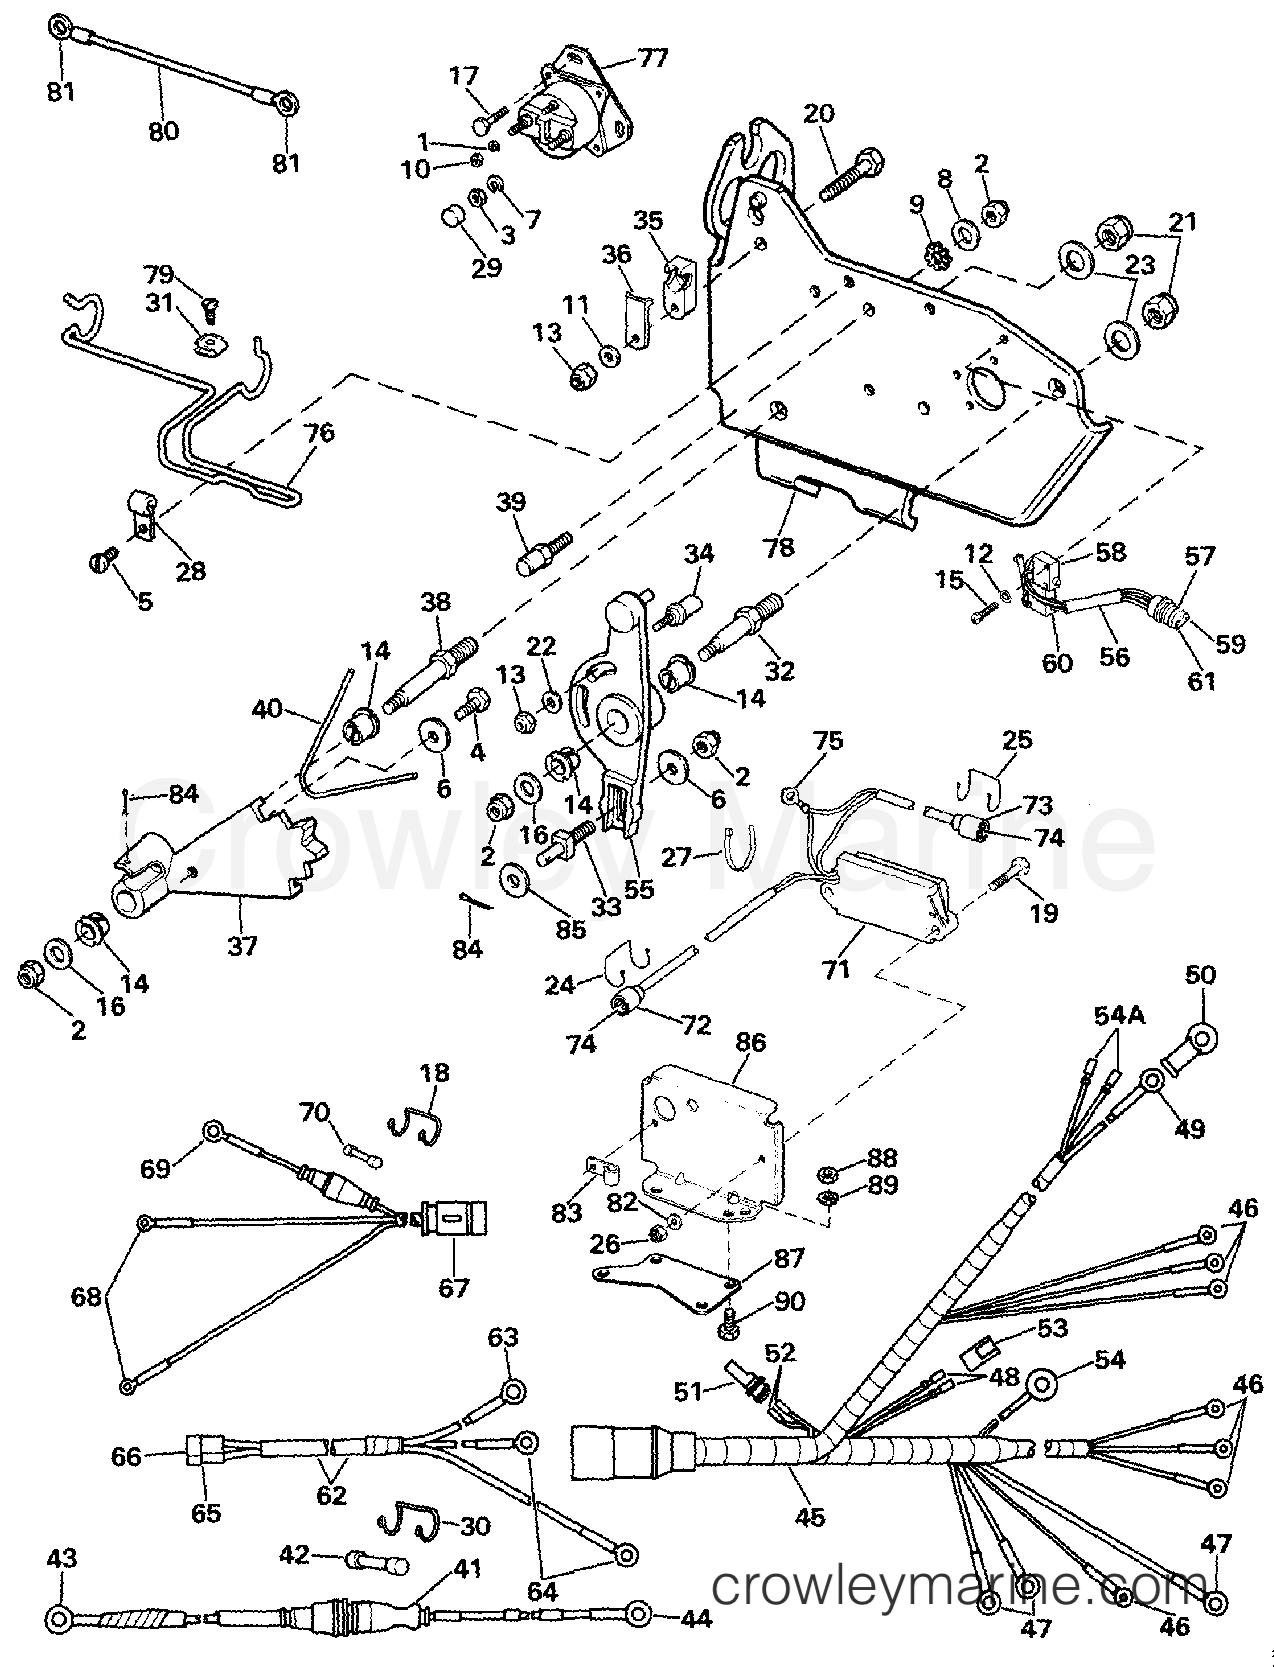 wire harness  bracket  u0026 solenoid